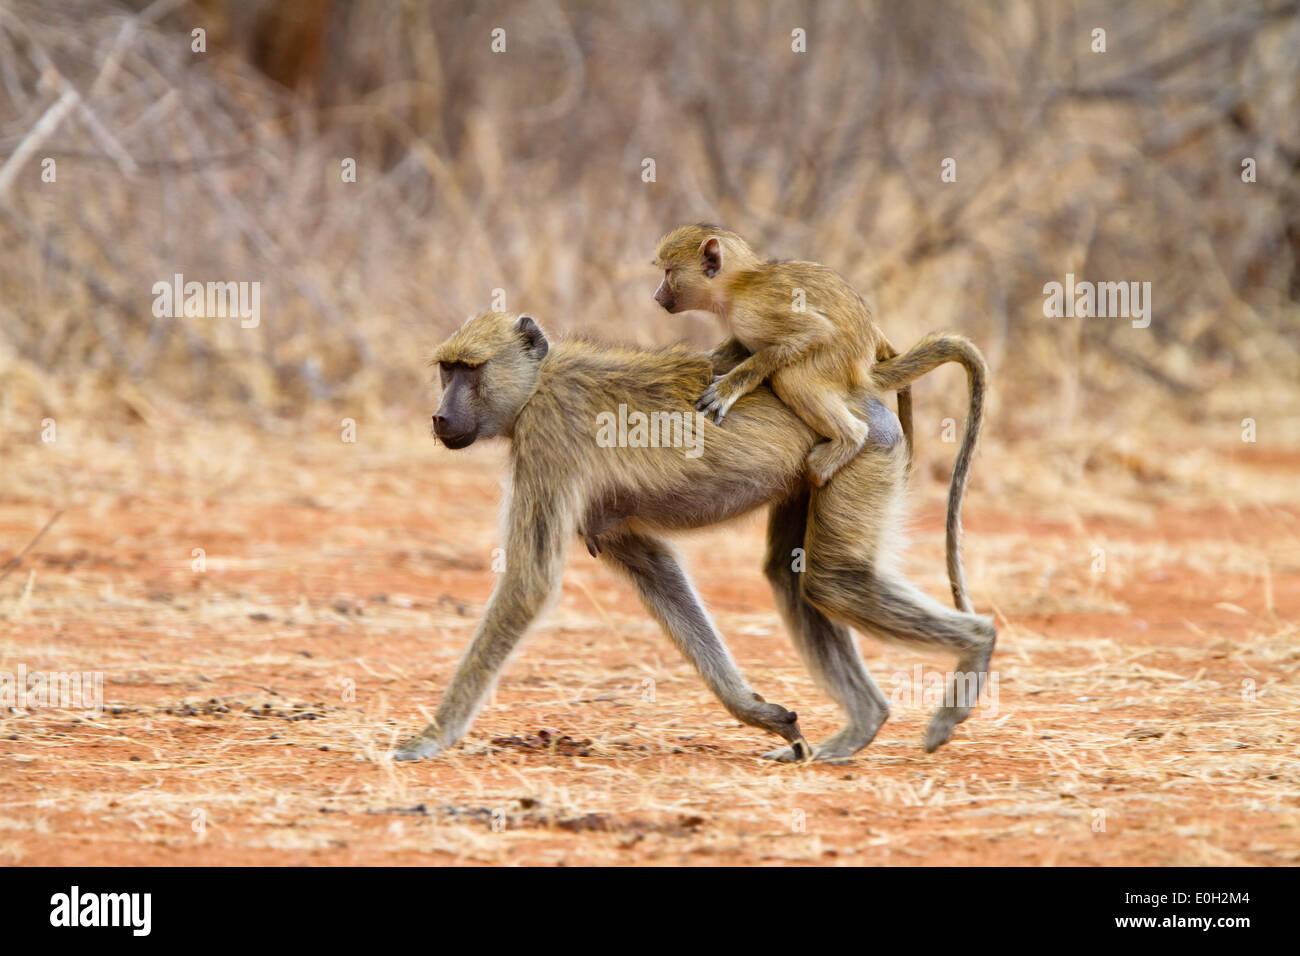 Yellow Baboon with baby, Papio cynocephalus, Lake Tanganjika, Ruaha National Park, Tanzania, East Africa, Africa - Stock Image